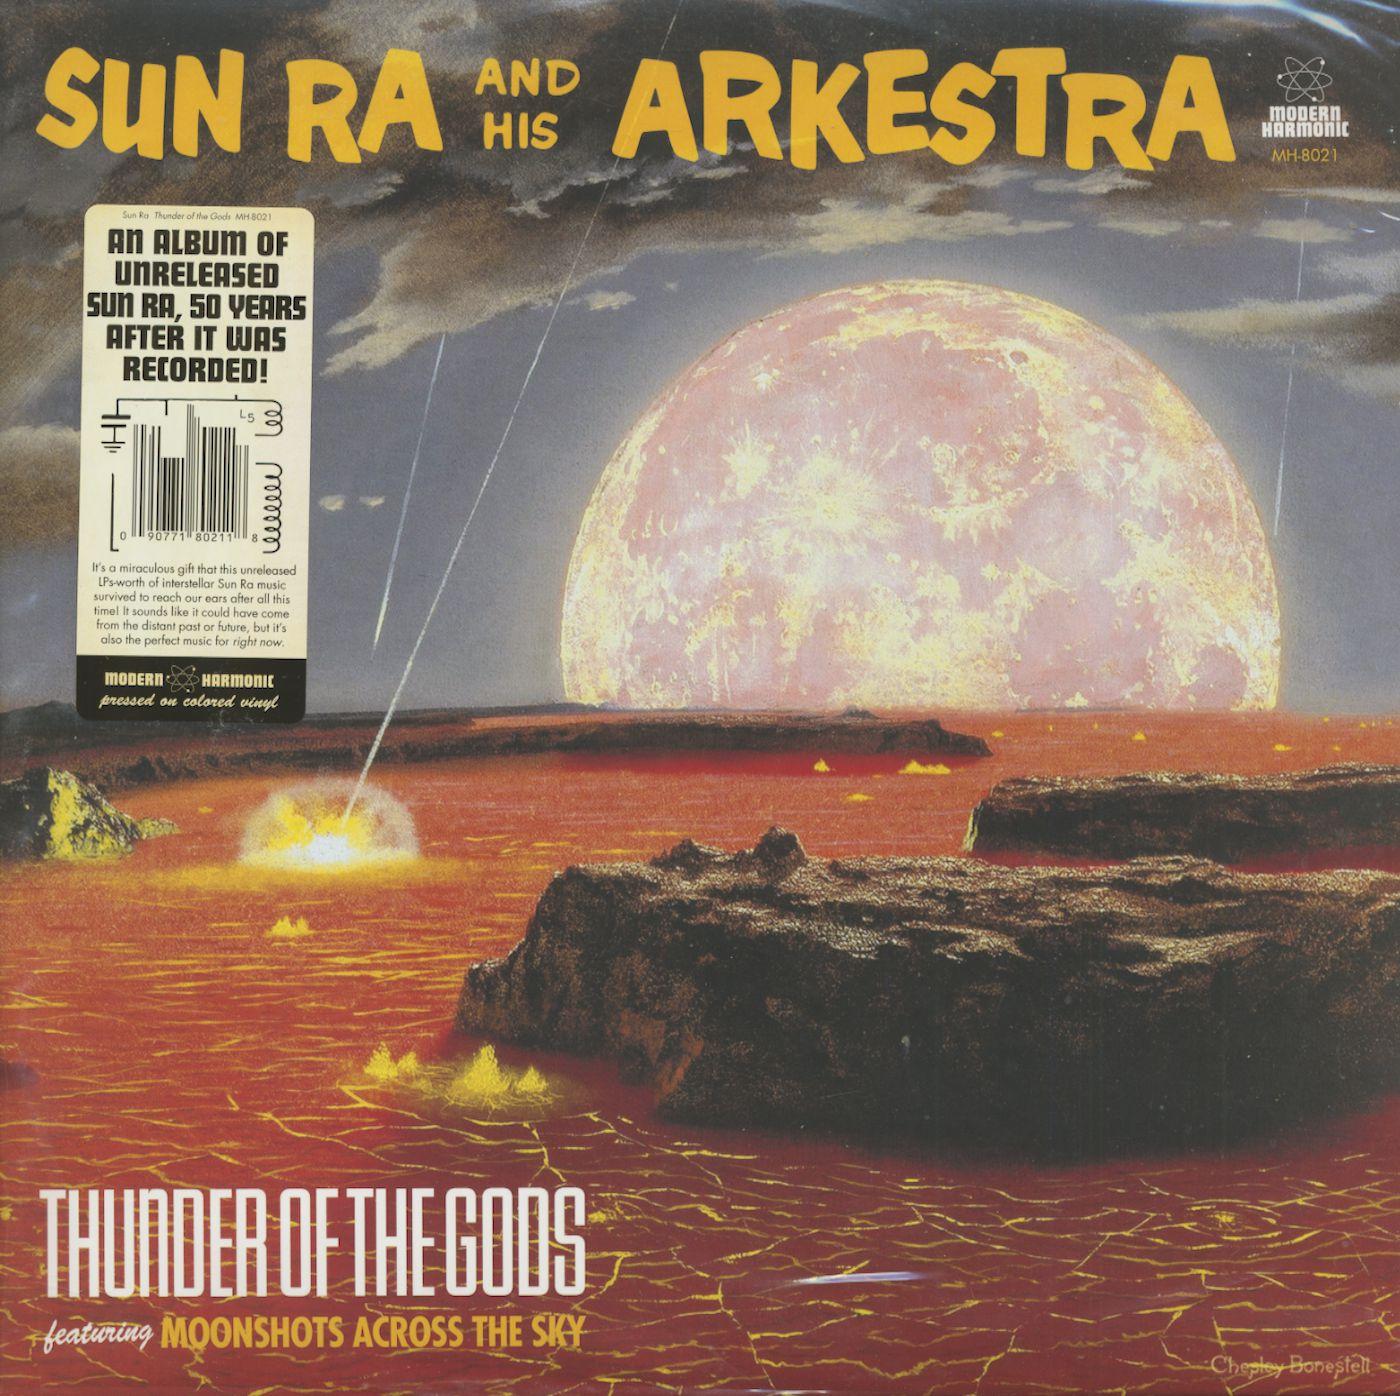 Sun Ra & His Arkestra LP : Thunder Of The Gods (LP) - Bear Family Records